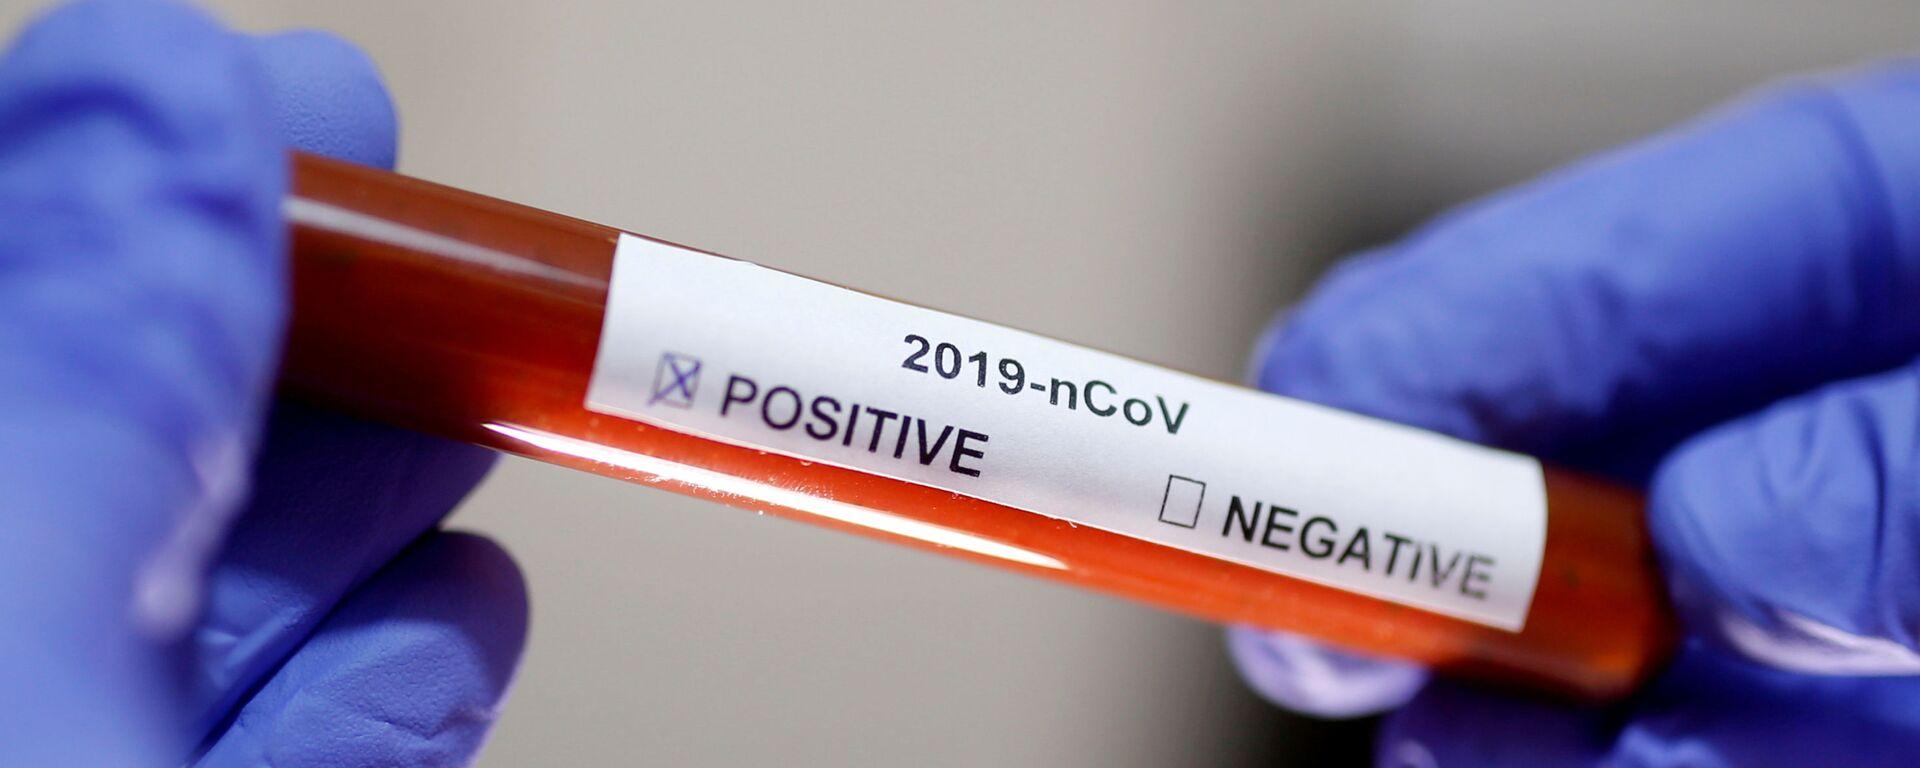 Test na koronavirus SARS-CoV-2 - Sputnik Česká republika, 1920, 26.02.2021